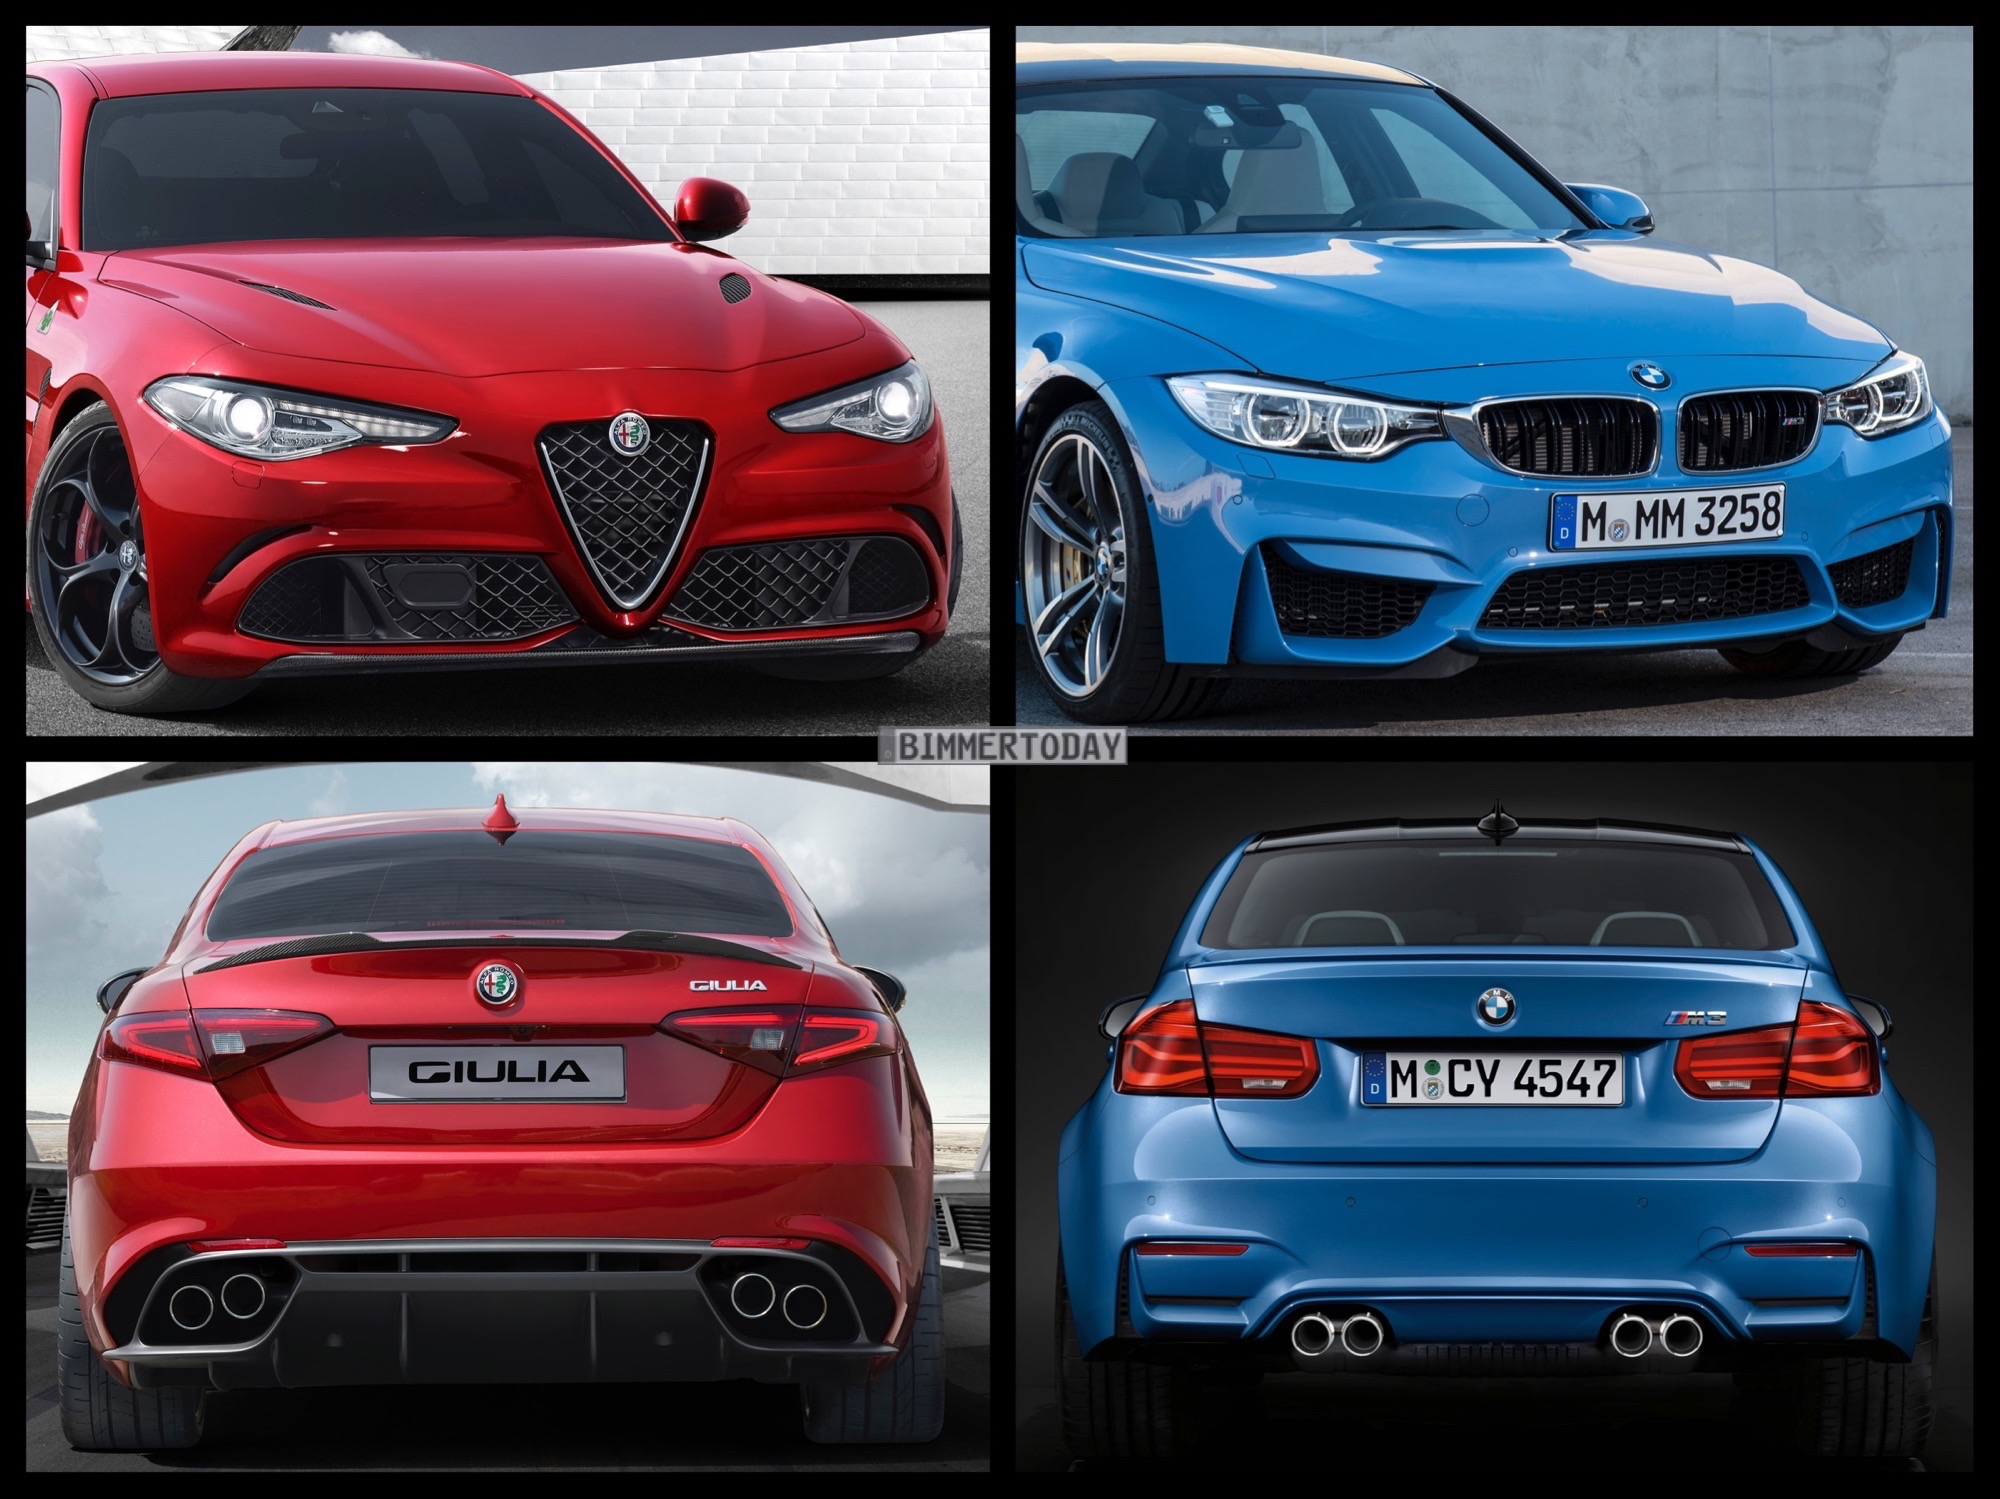 Bild Vergleich BMW M3 F80 Alfa Romeo Giulia 2016 01